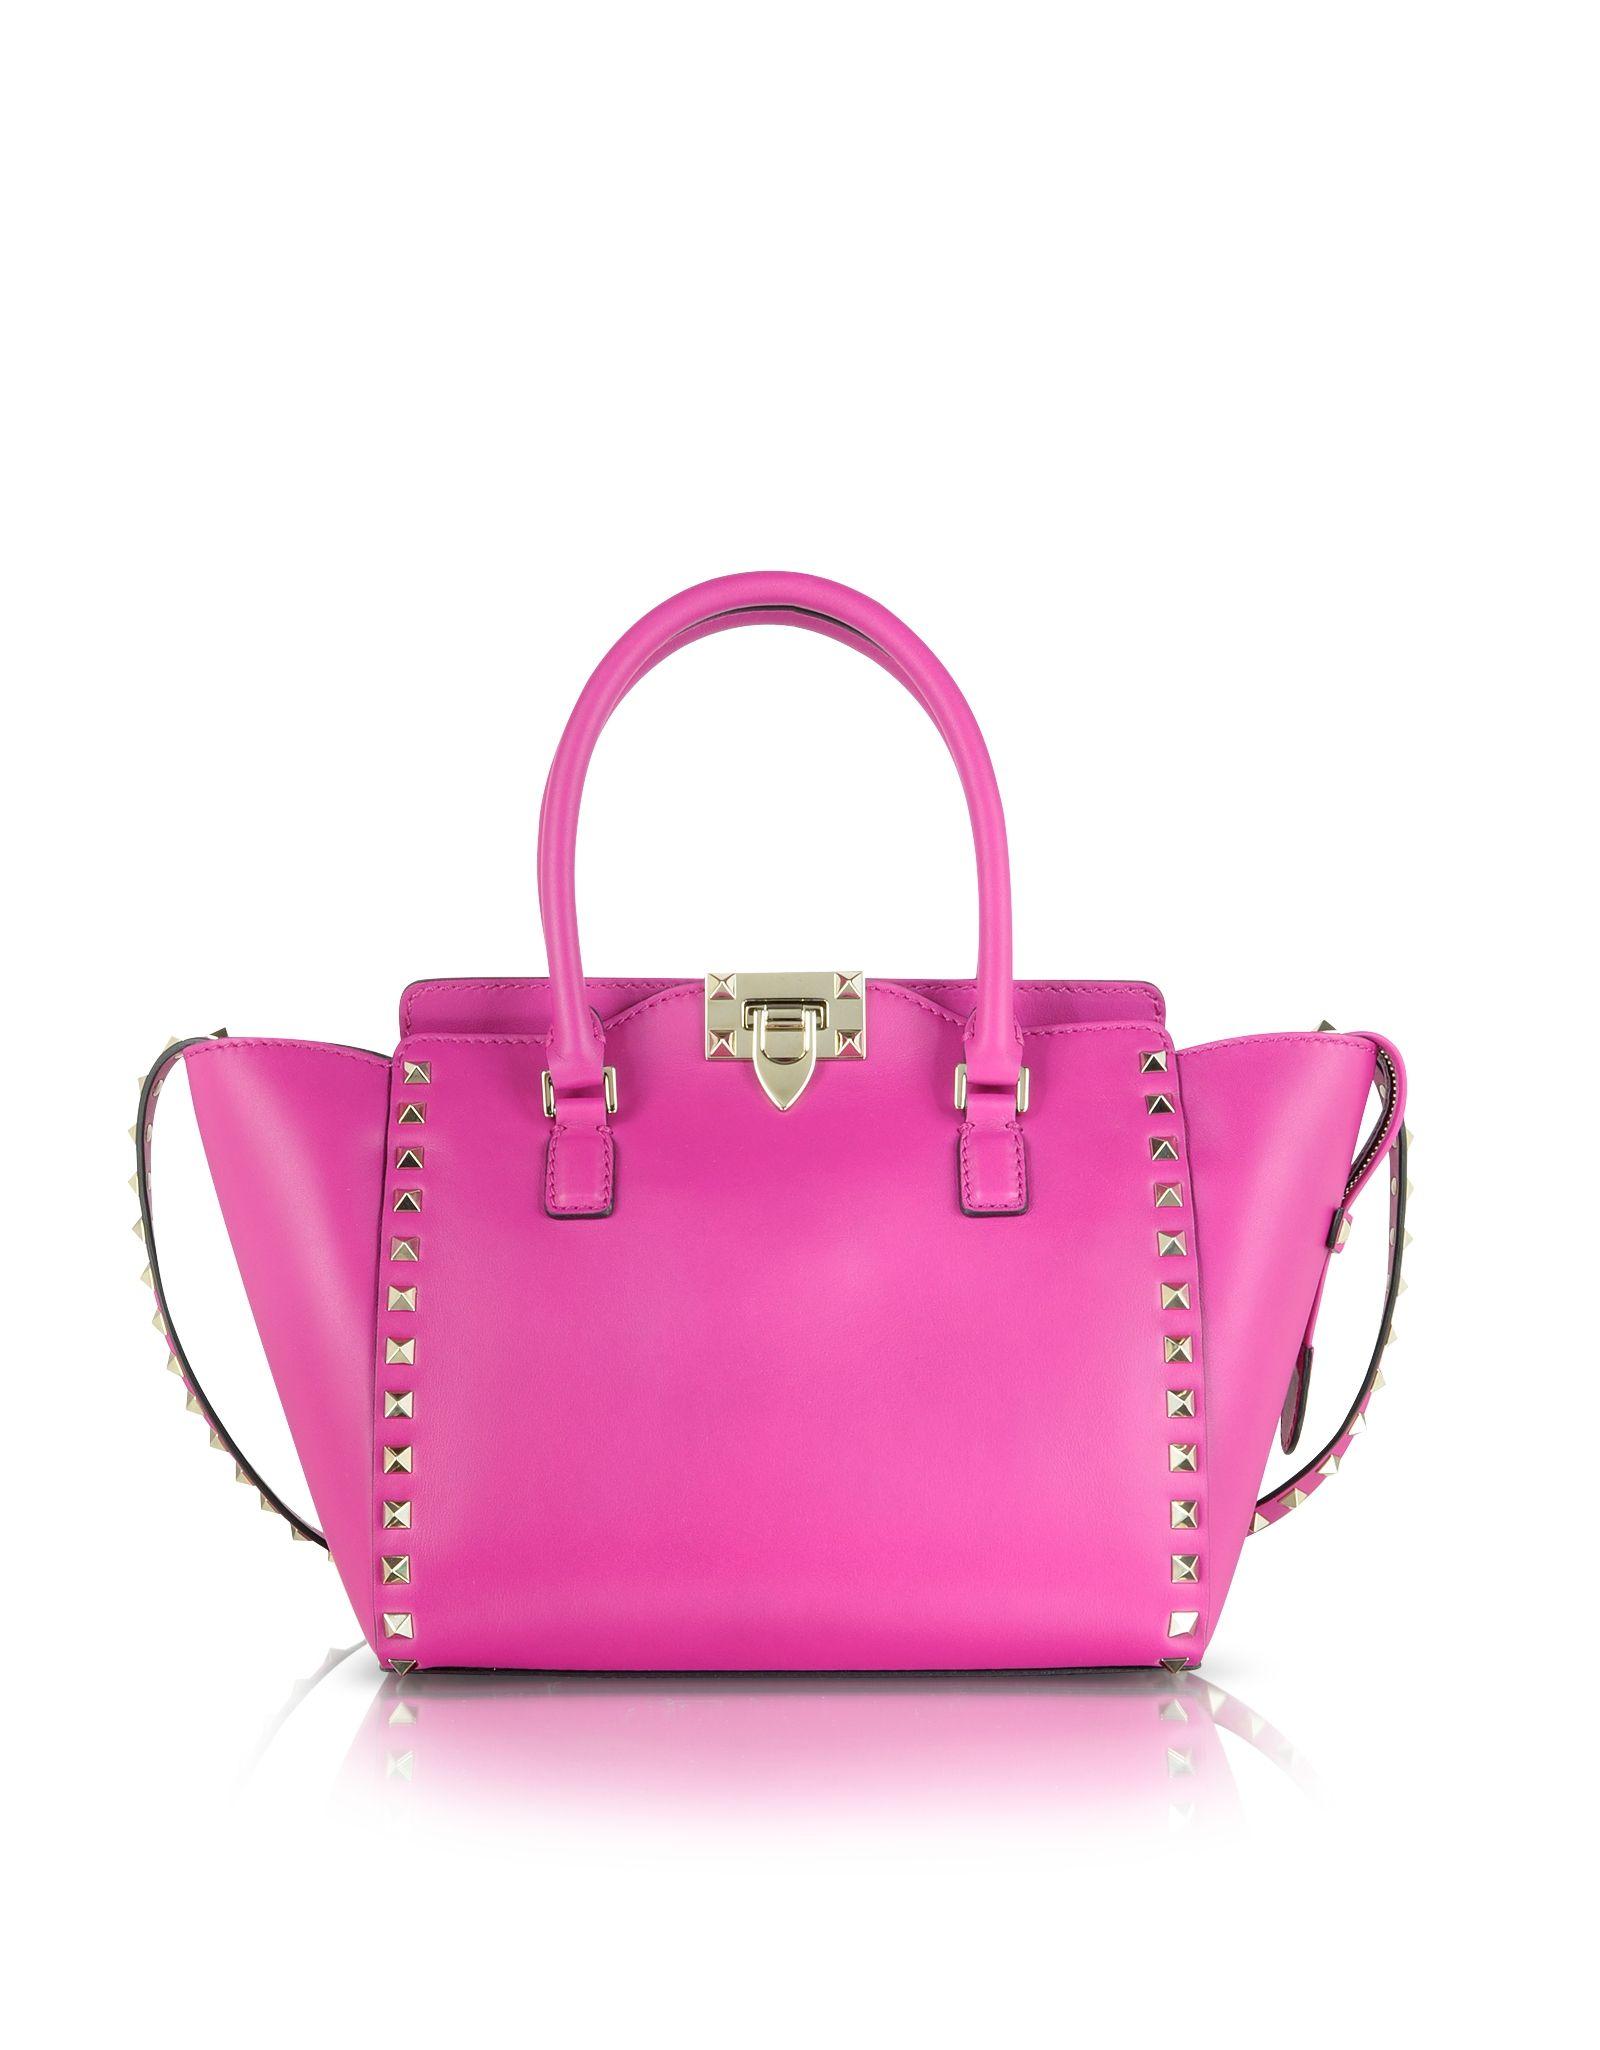 73f1cc09d6 Valentino Rockstud Fuxia Leather Small Double Handle Bag | VALENTINO ...